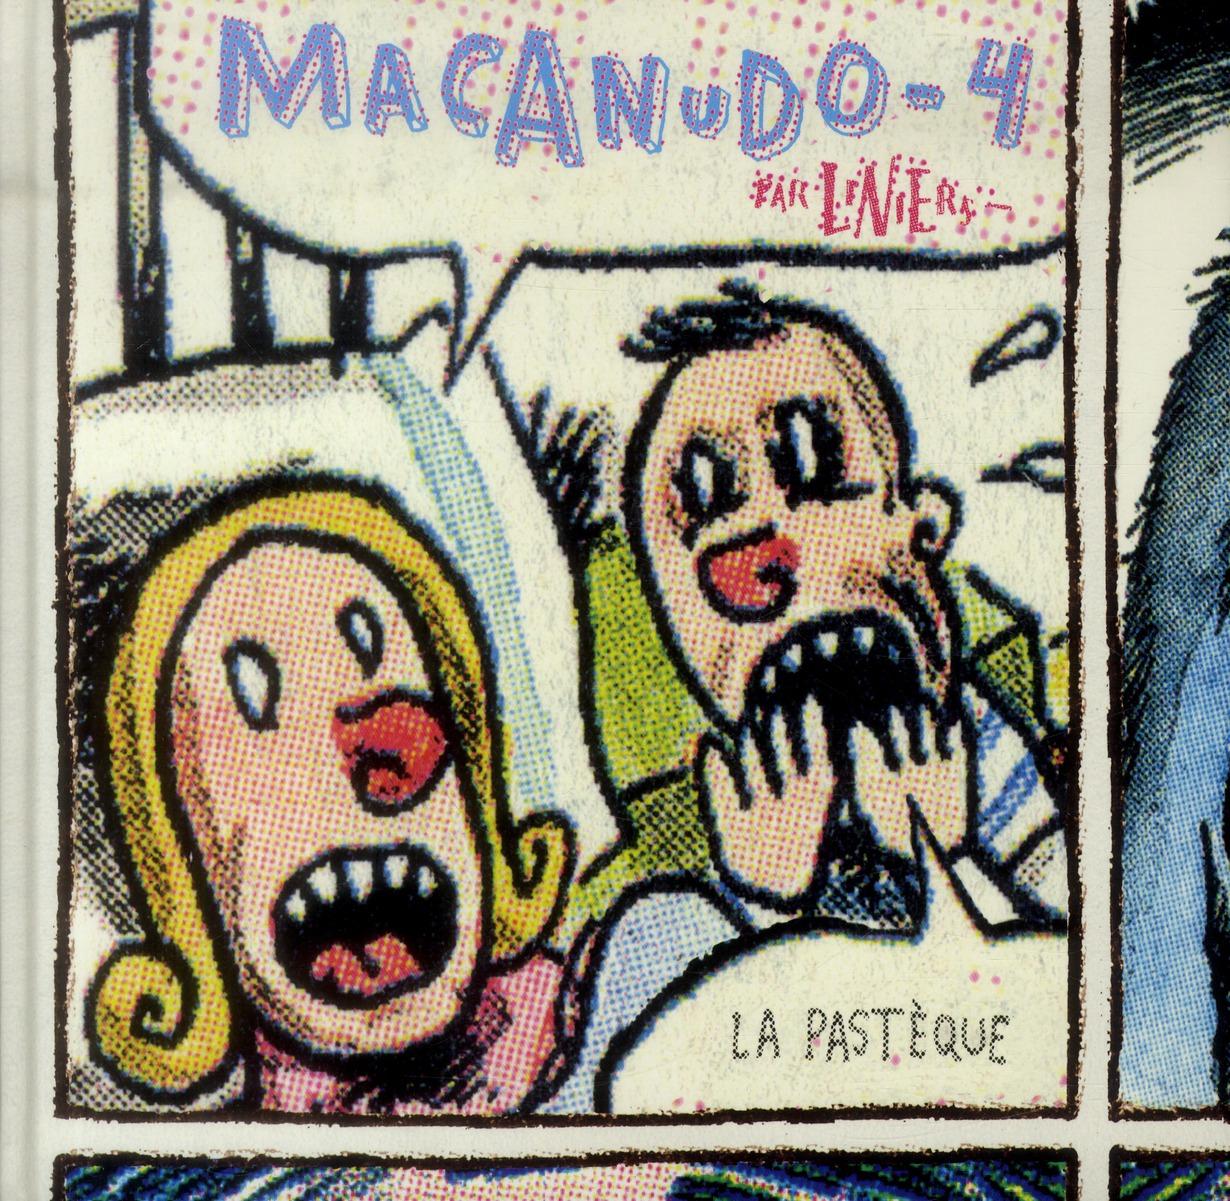 Macanudo t.4